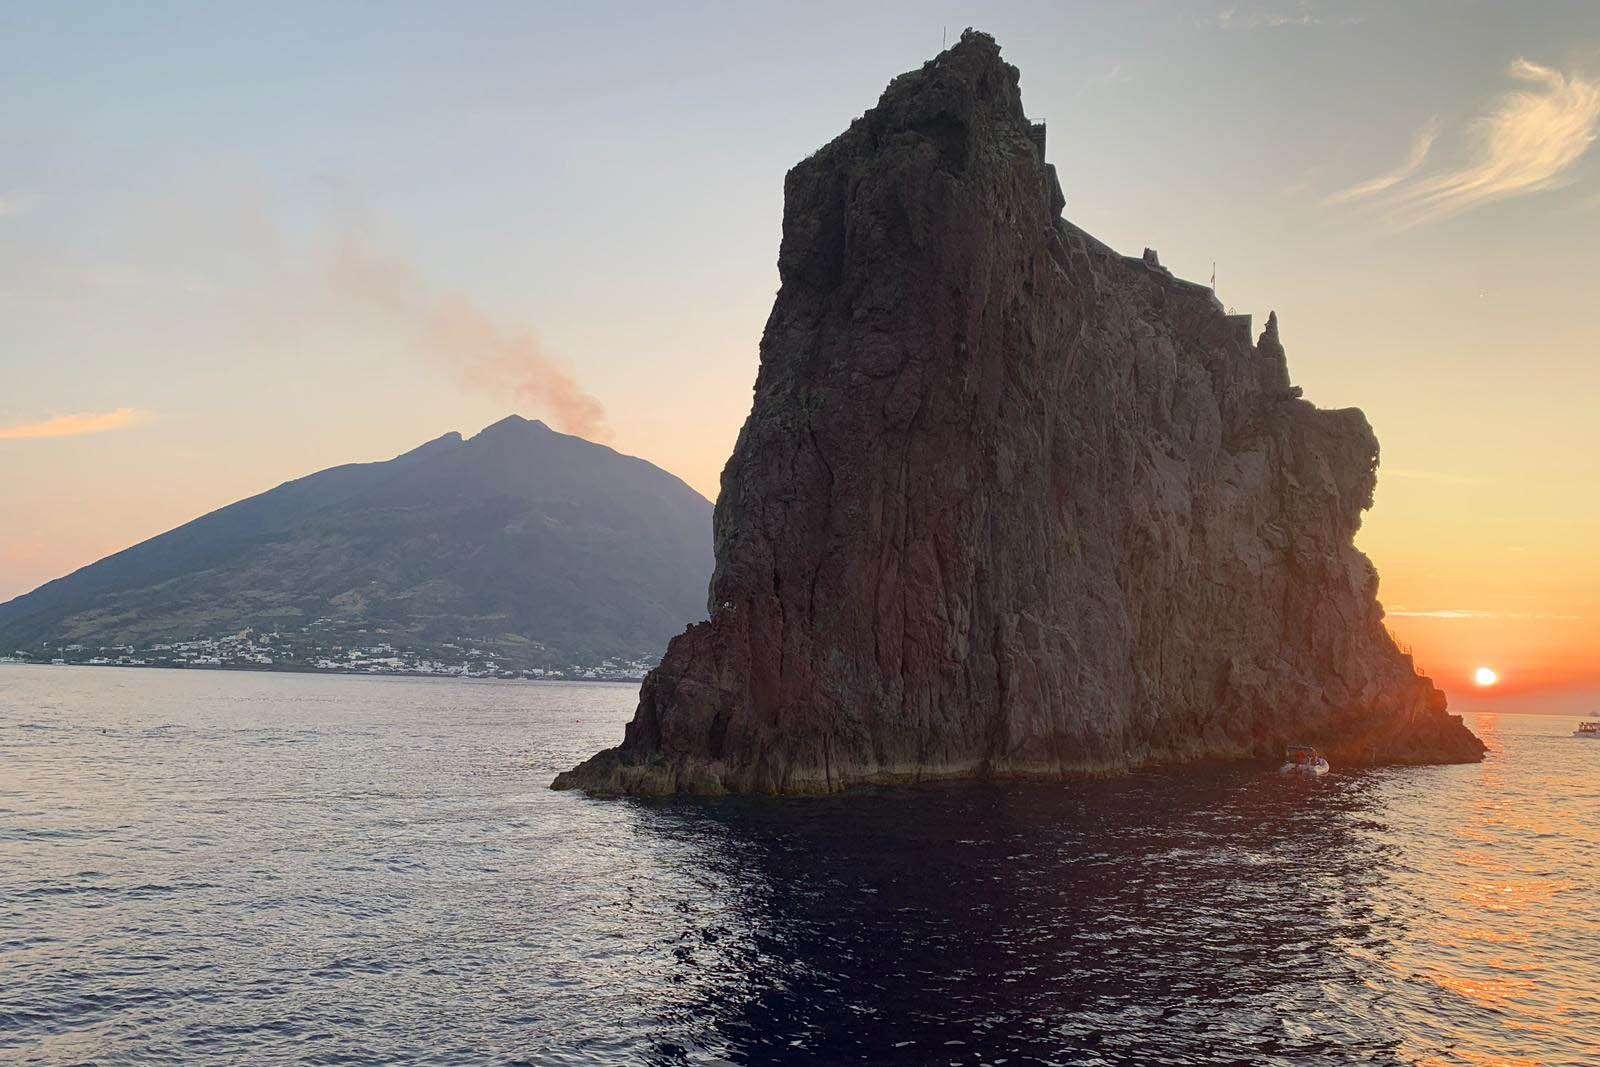 Day trip to Aeolian Islands: Panarea and Stromboli tour